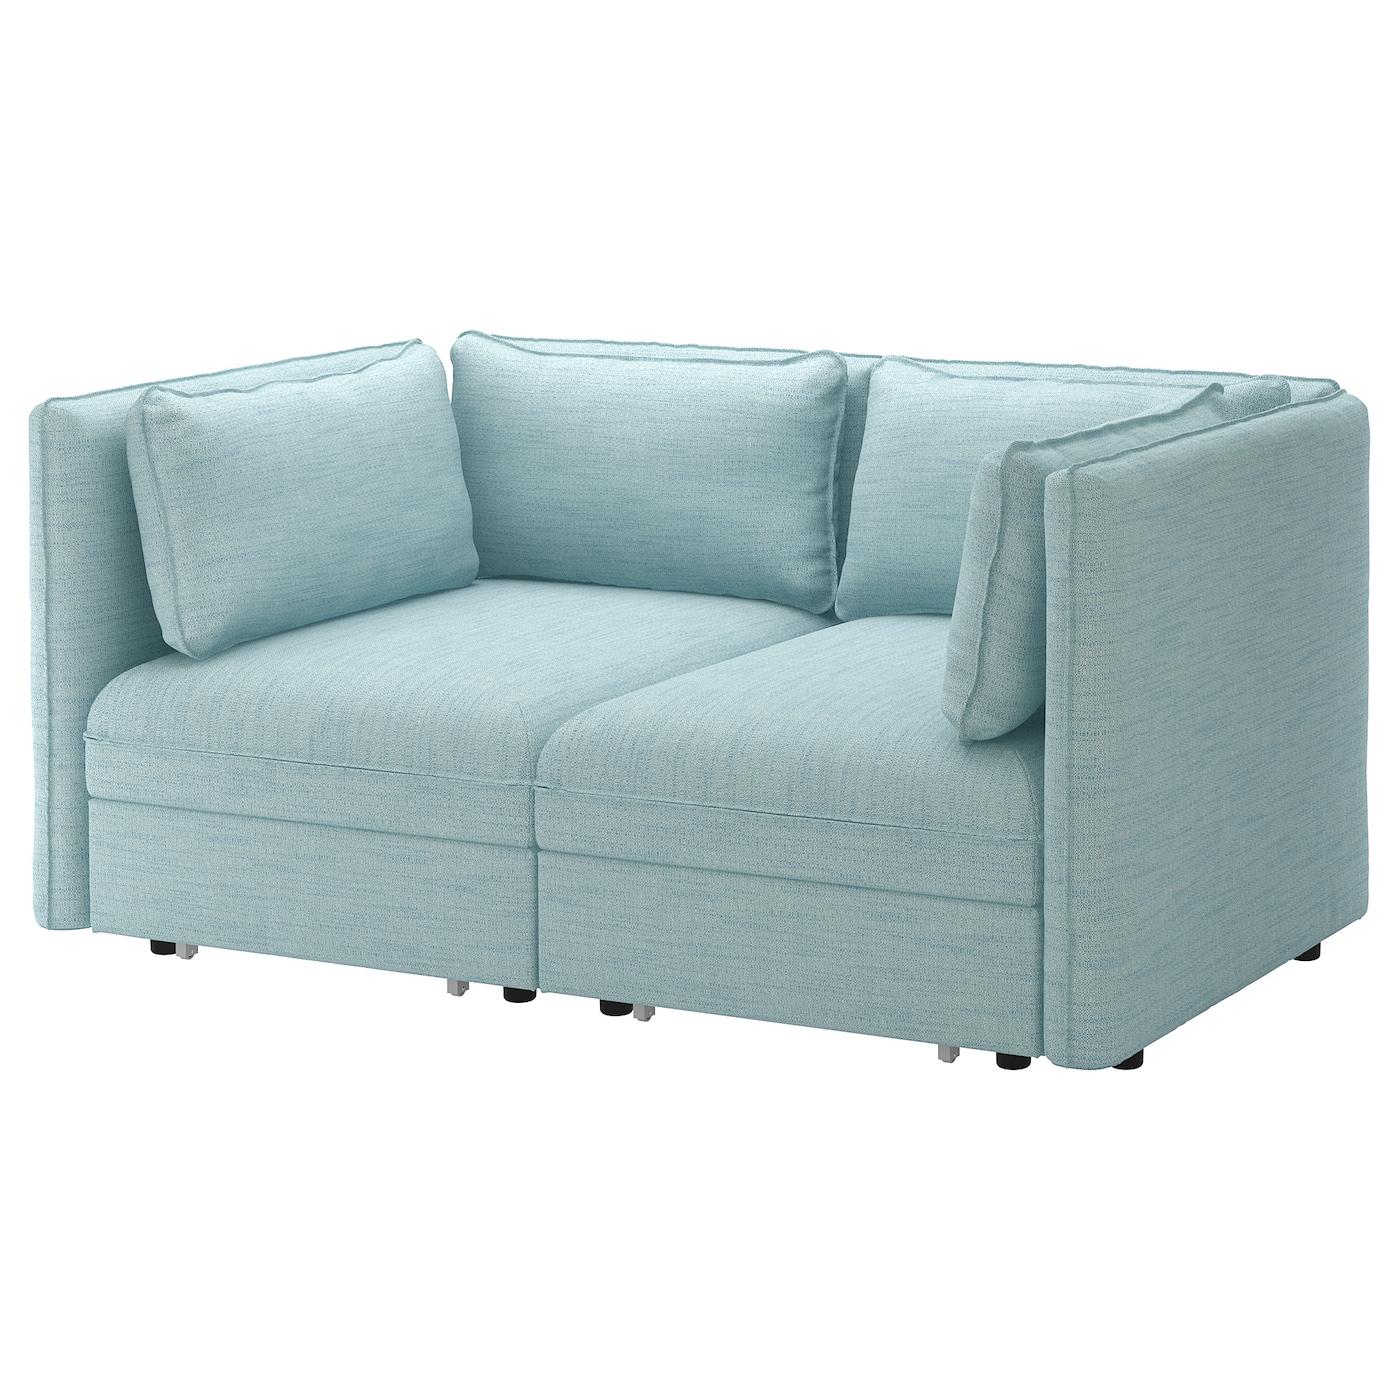 Ikea Vallentuna 2 Seat Modular Sofa W Beds